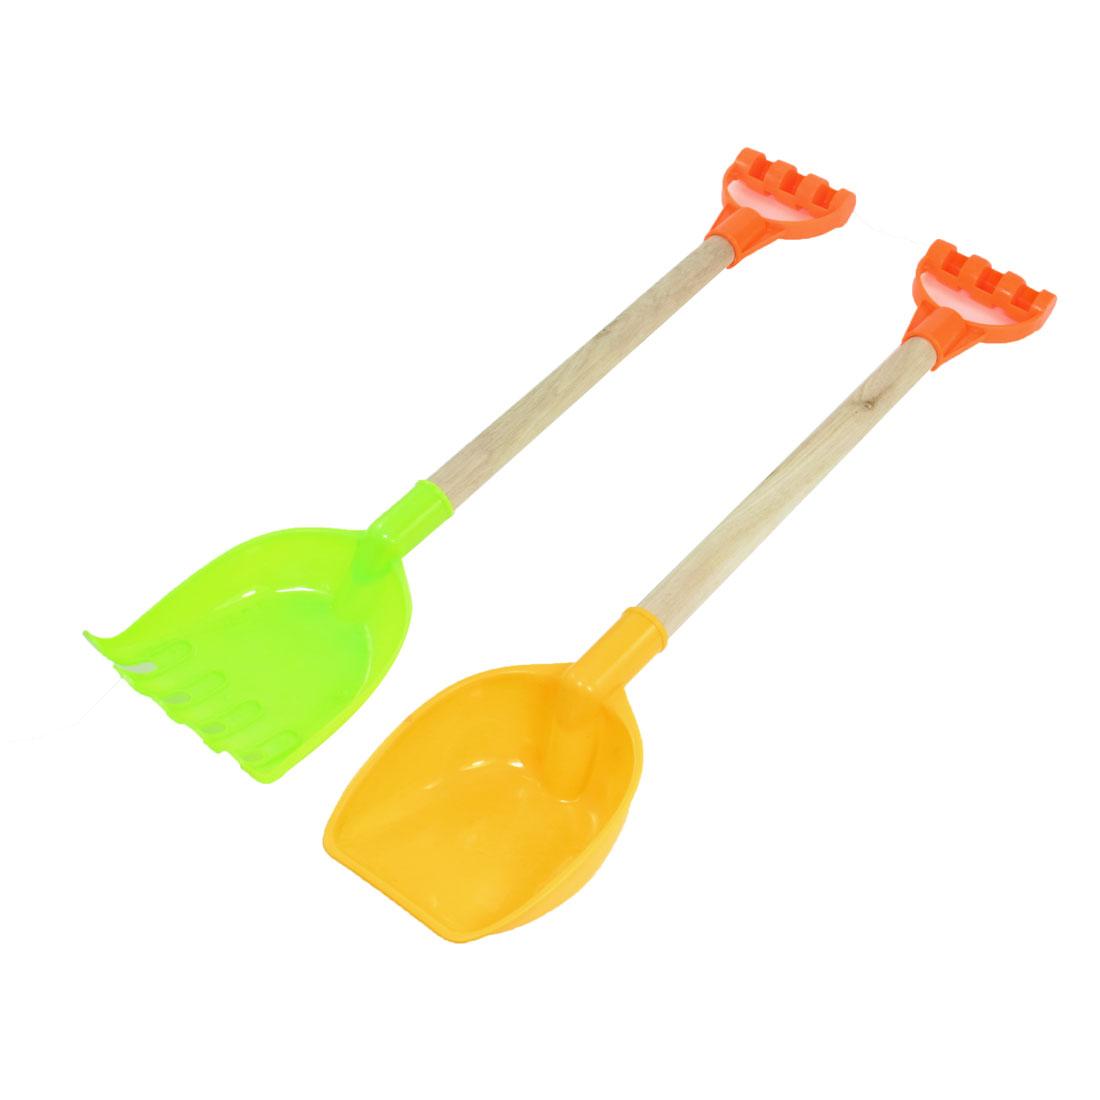 Red Wood Handle Light Green Yellow Plastic Sand Shovel Rake Toy 2 Pcs